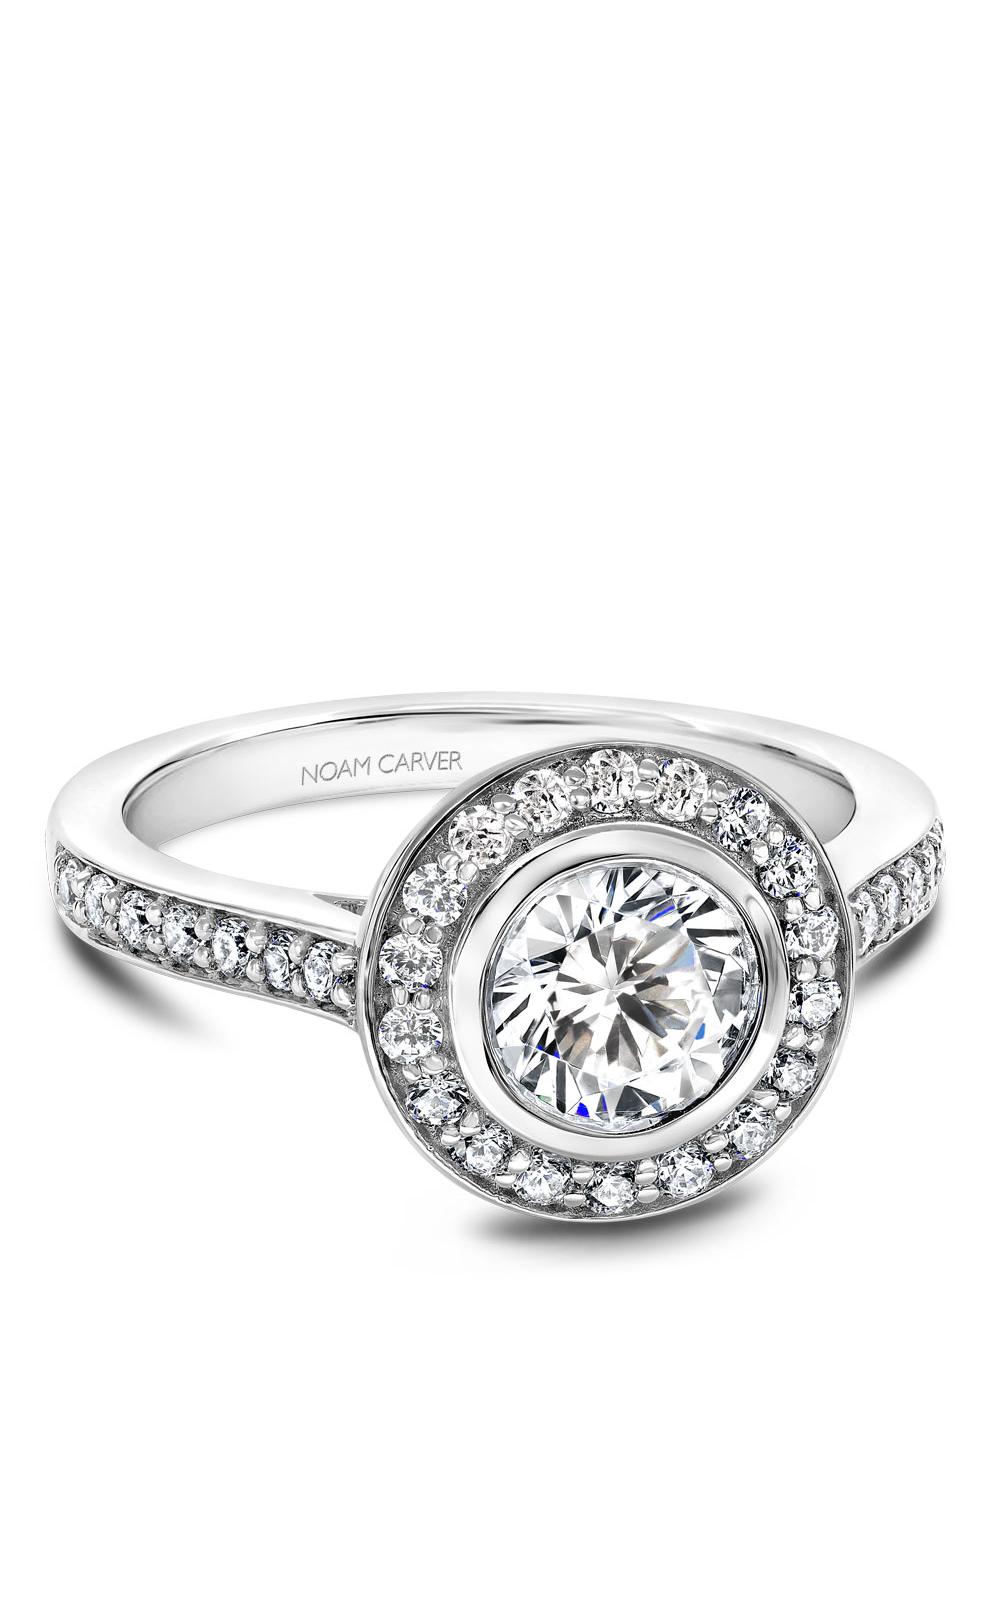 Noam Carver Halo Engagement Ring B153-01WM product image